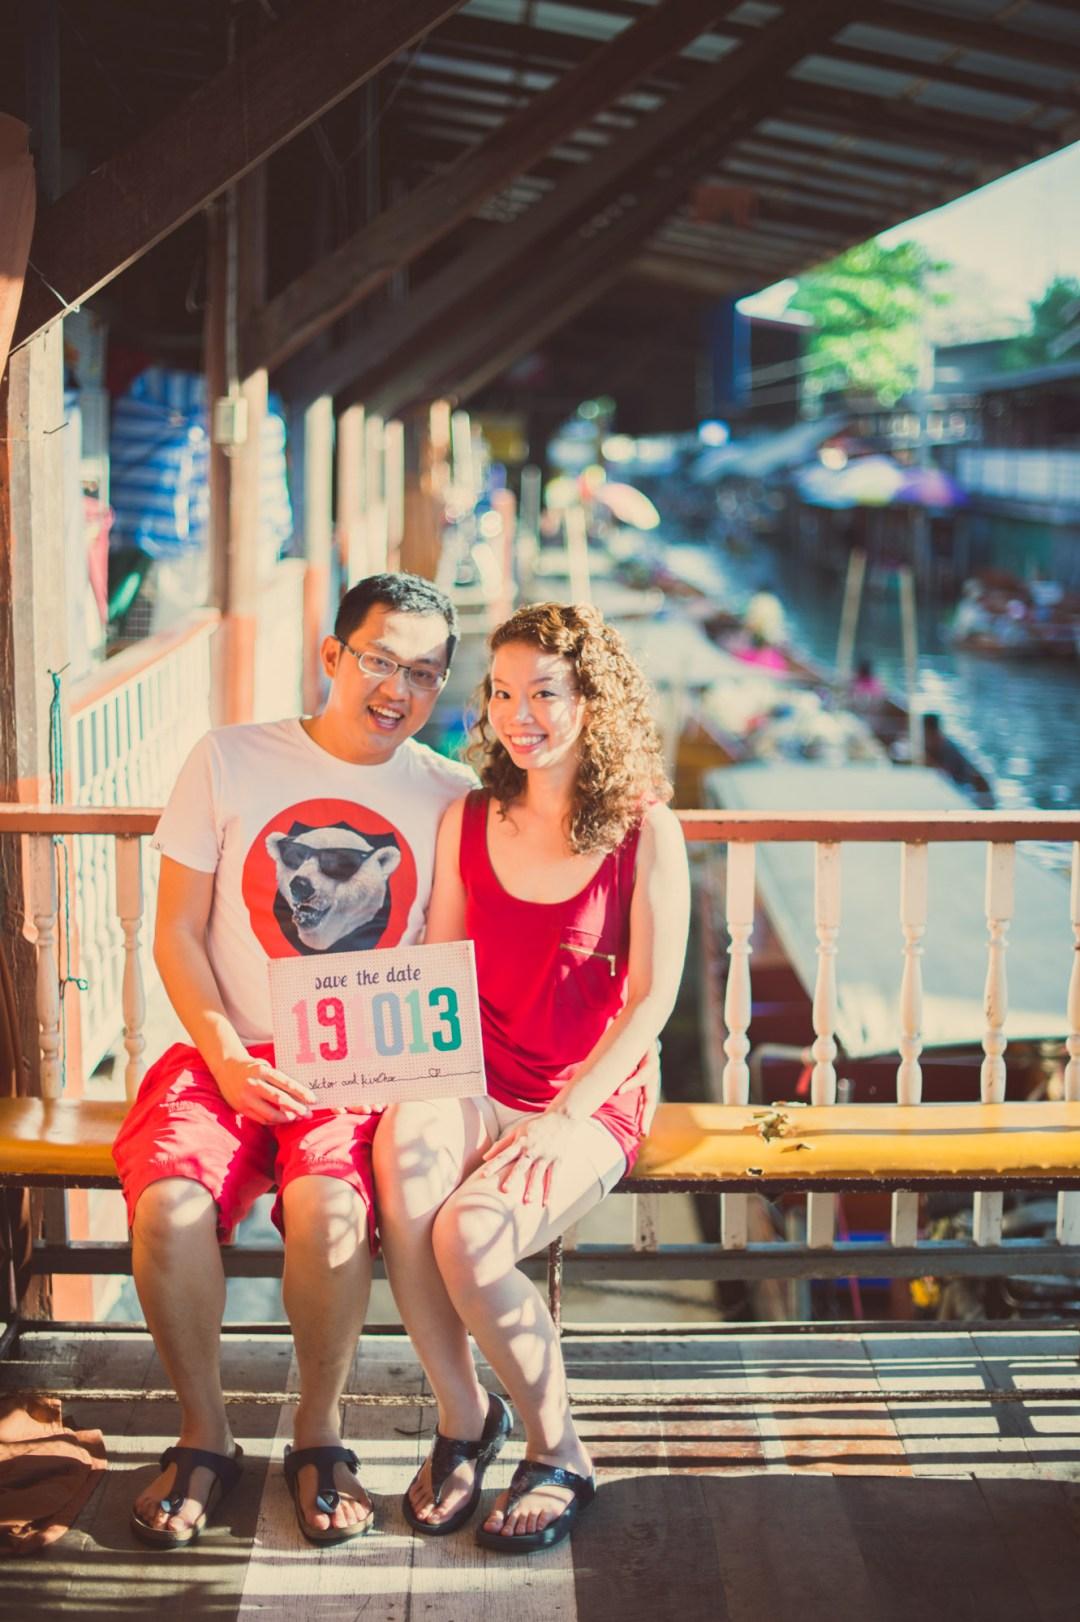 Thailand Wedding Photography | Damnoensaduak Floating Market Pre-Wedding Photography